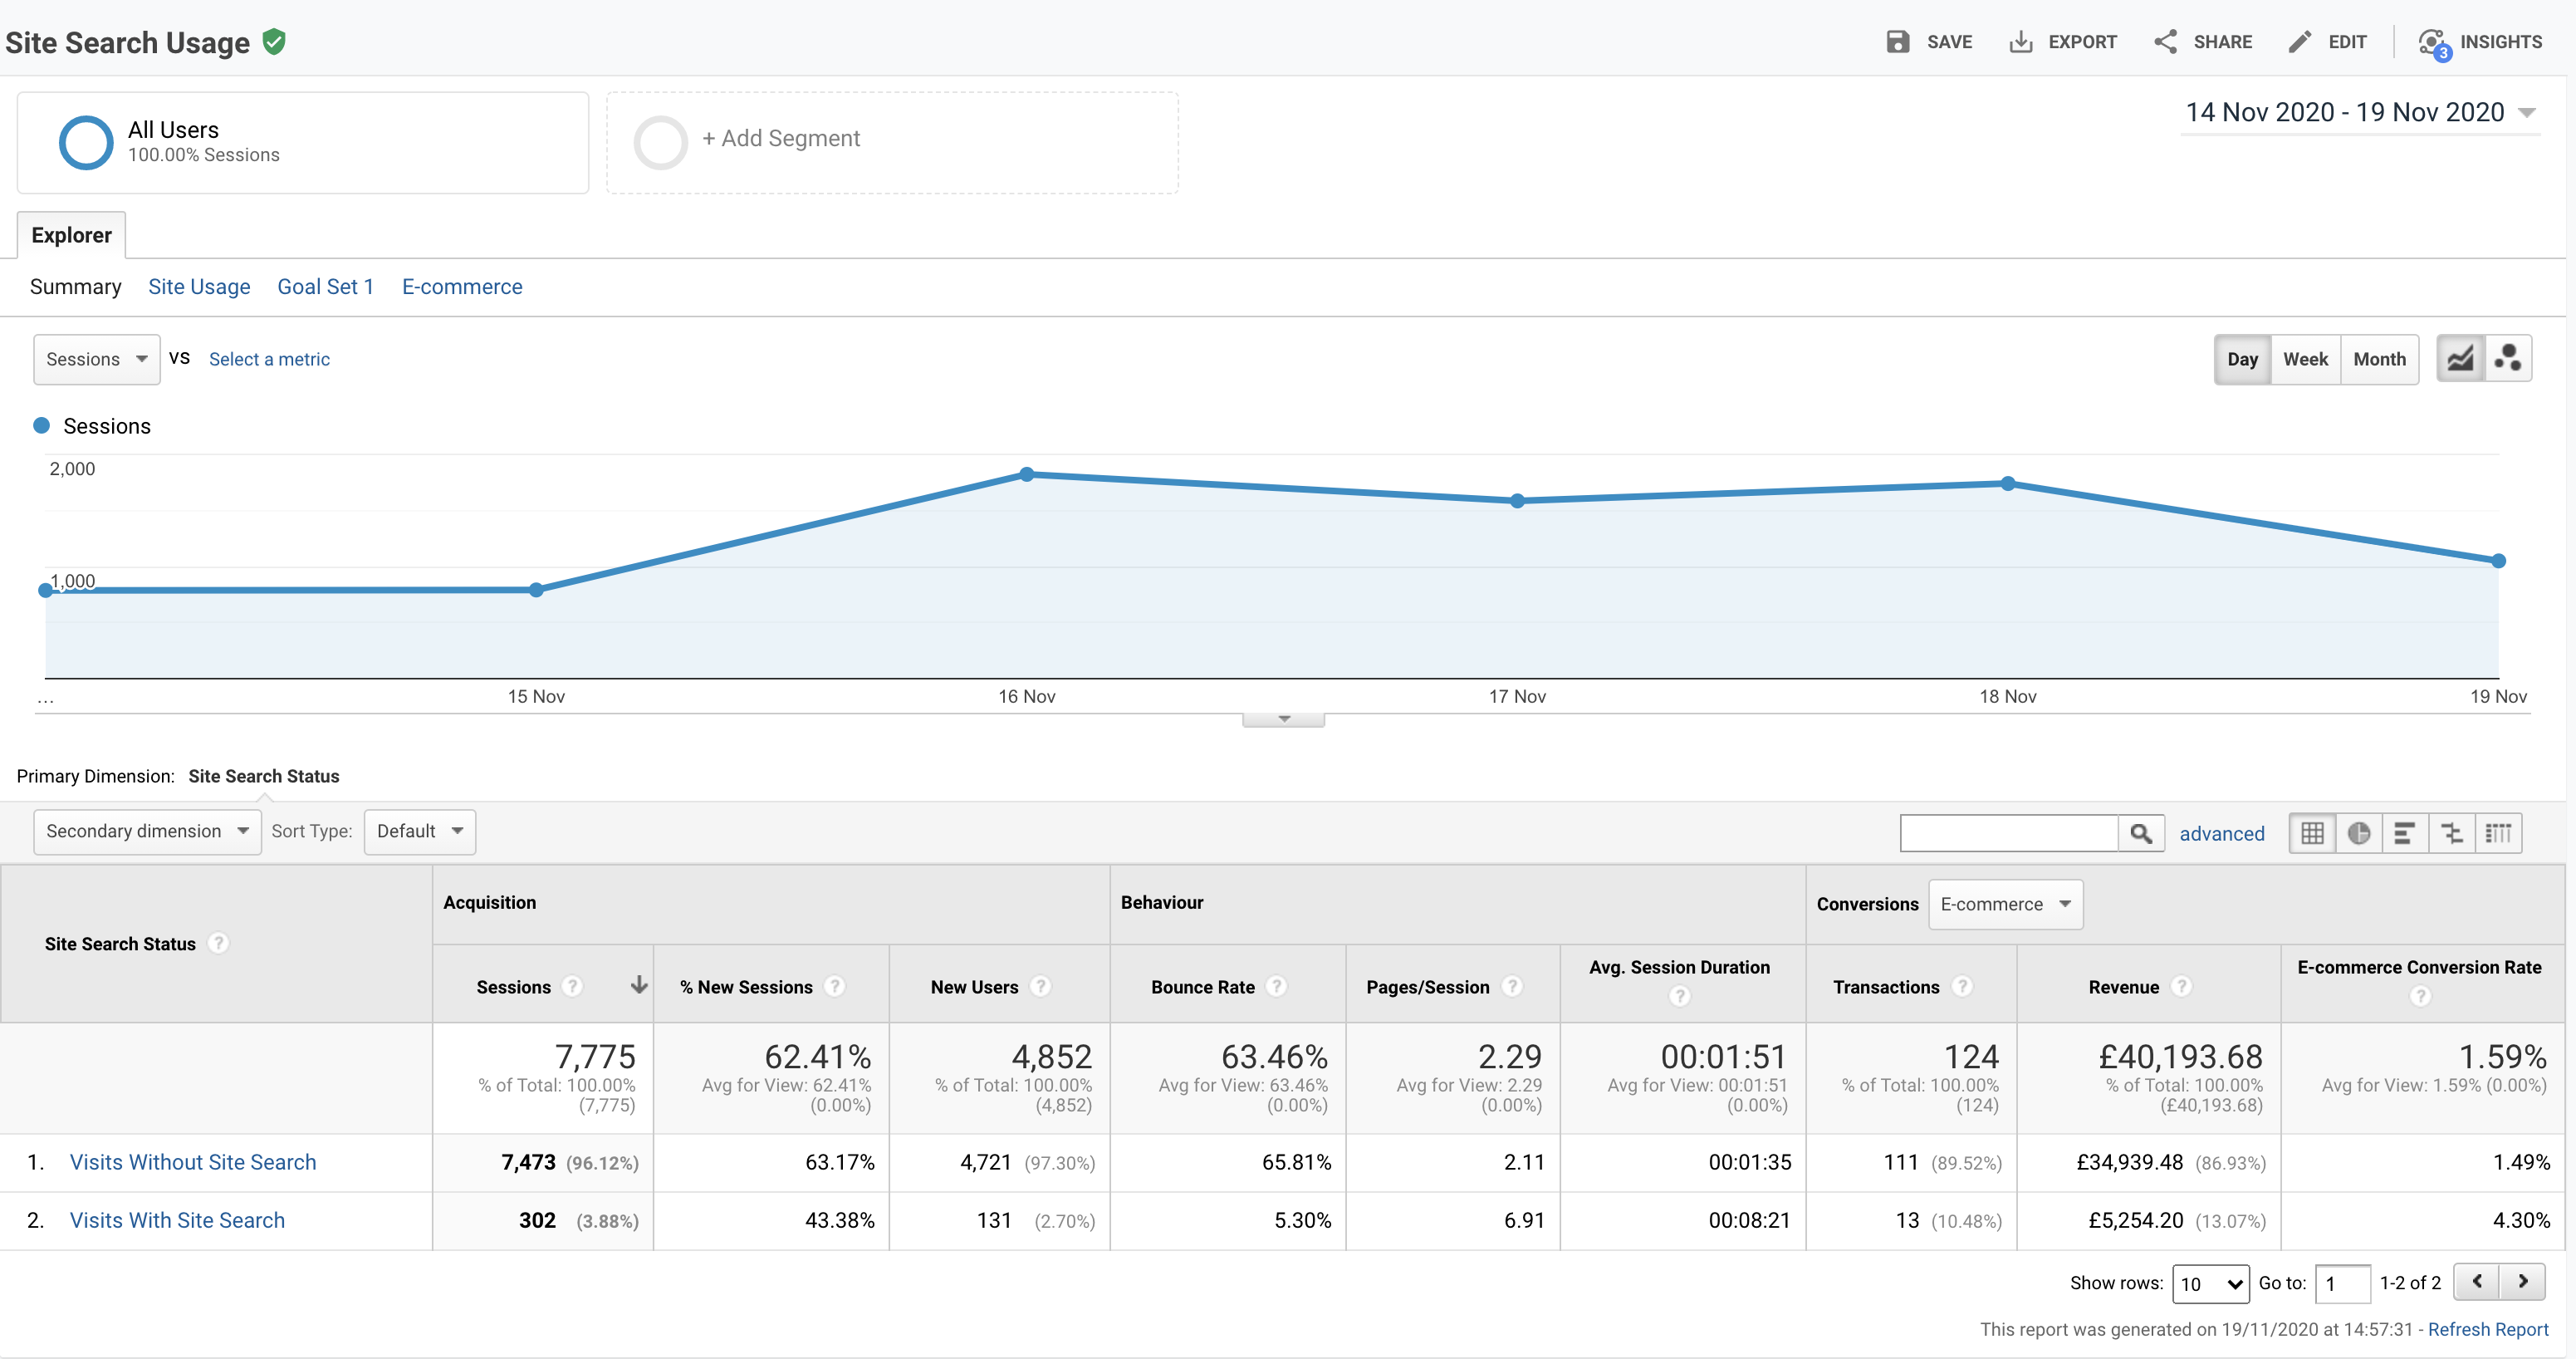 Screenshot of conversion rate graph